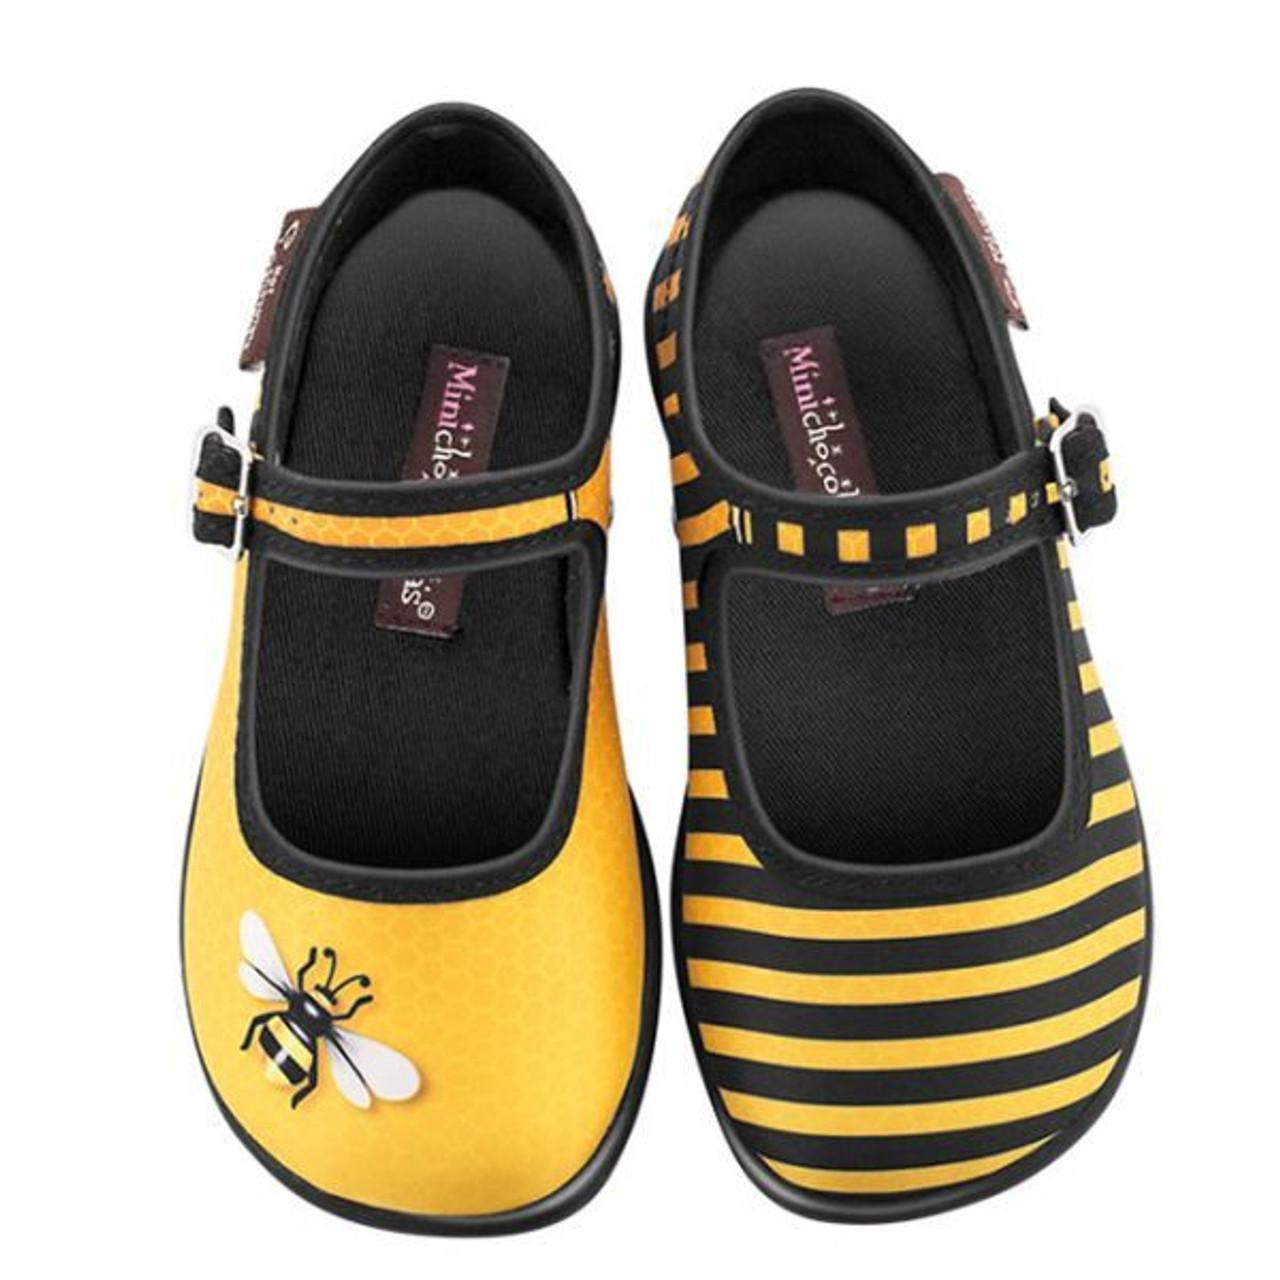 579a270d3c51 Chocolaticas Mini Honey shoes - Keeper   Hive